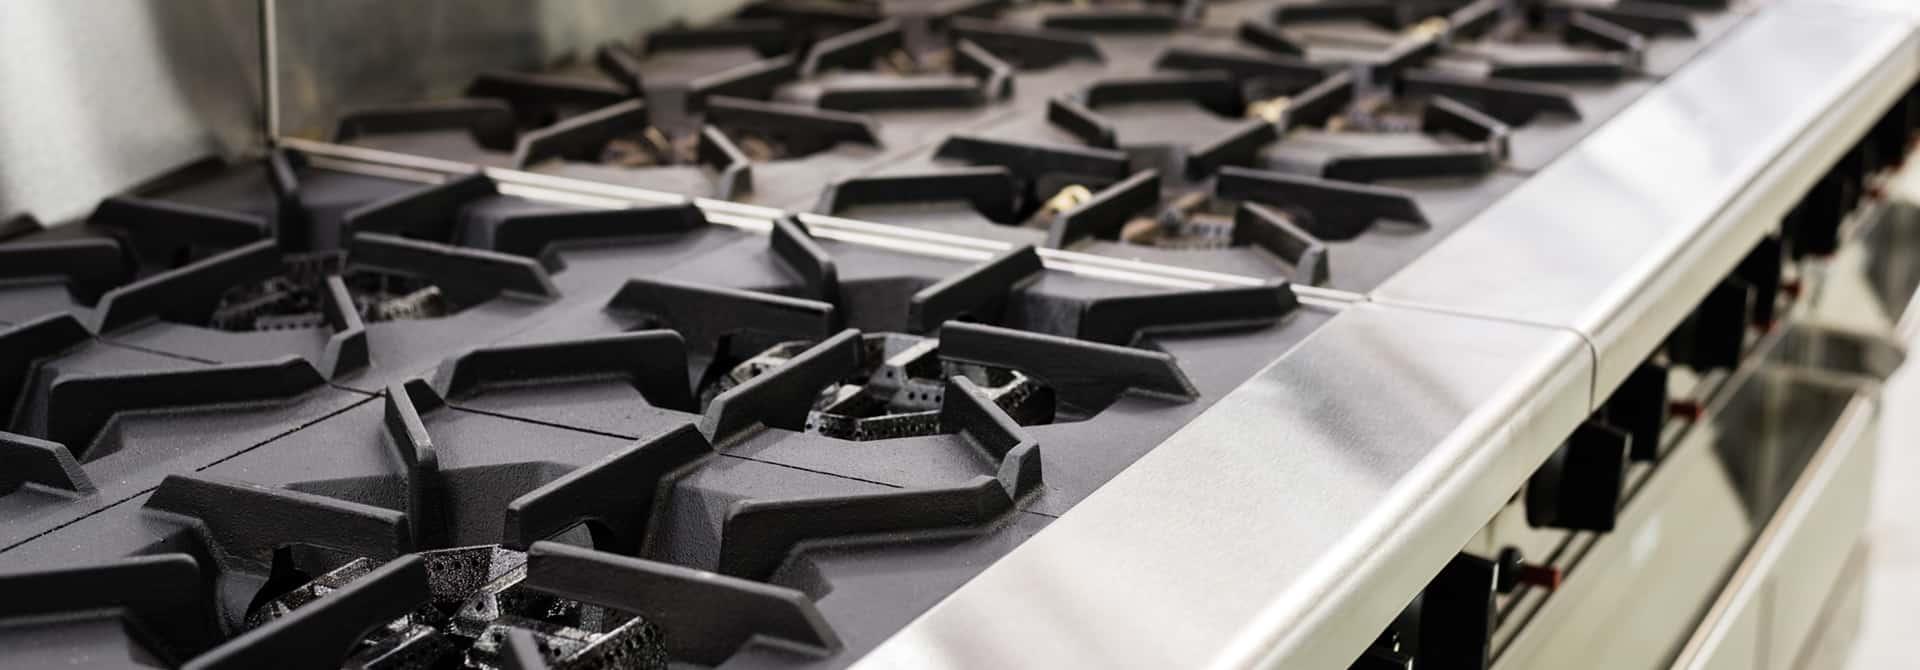 Commercial Kitchen Equipment & Refrigerator Manufacturer